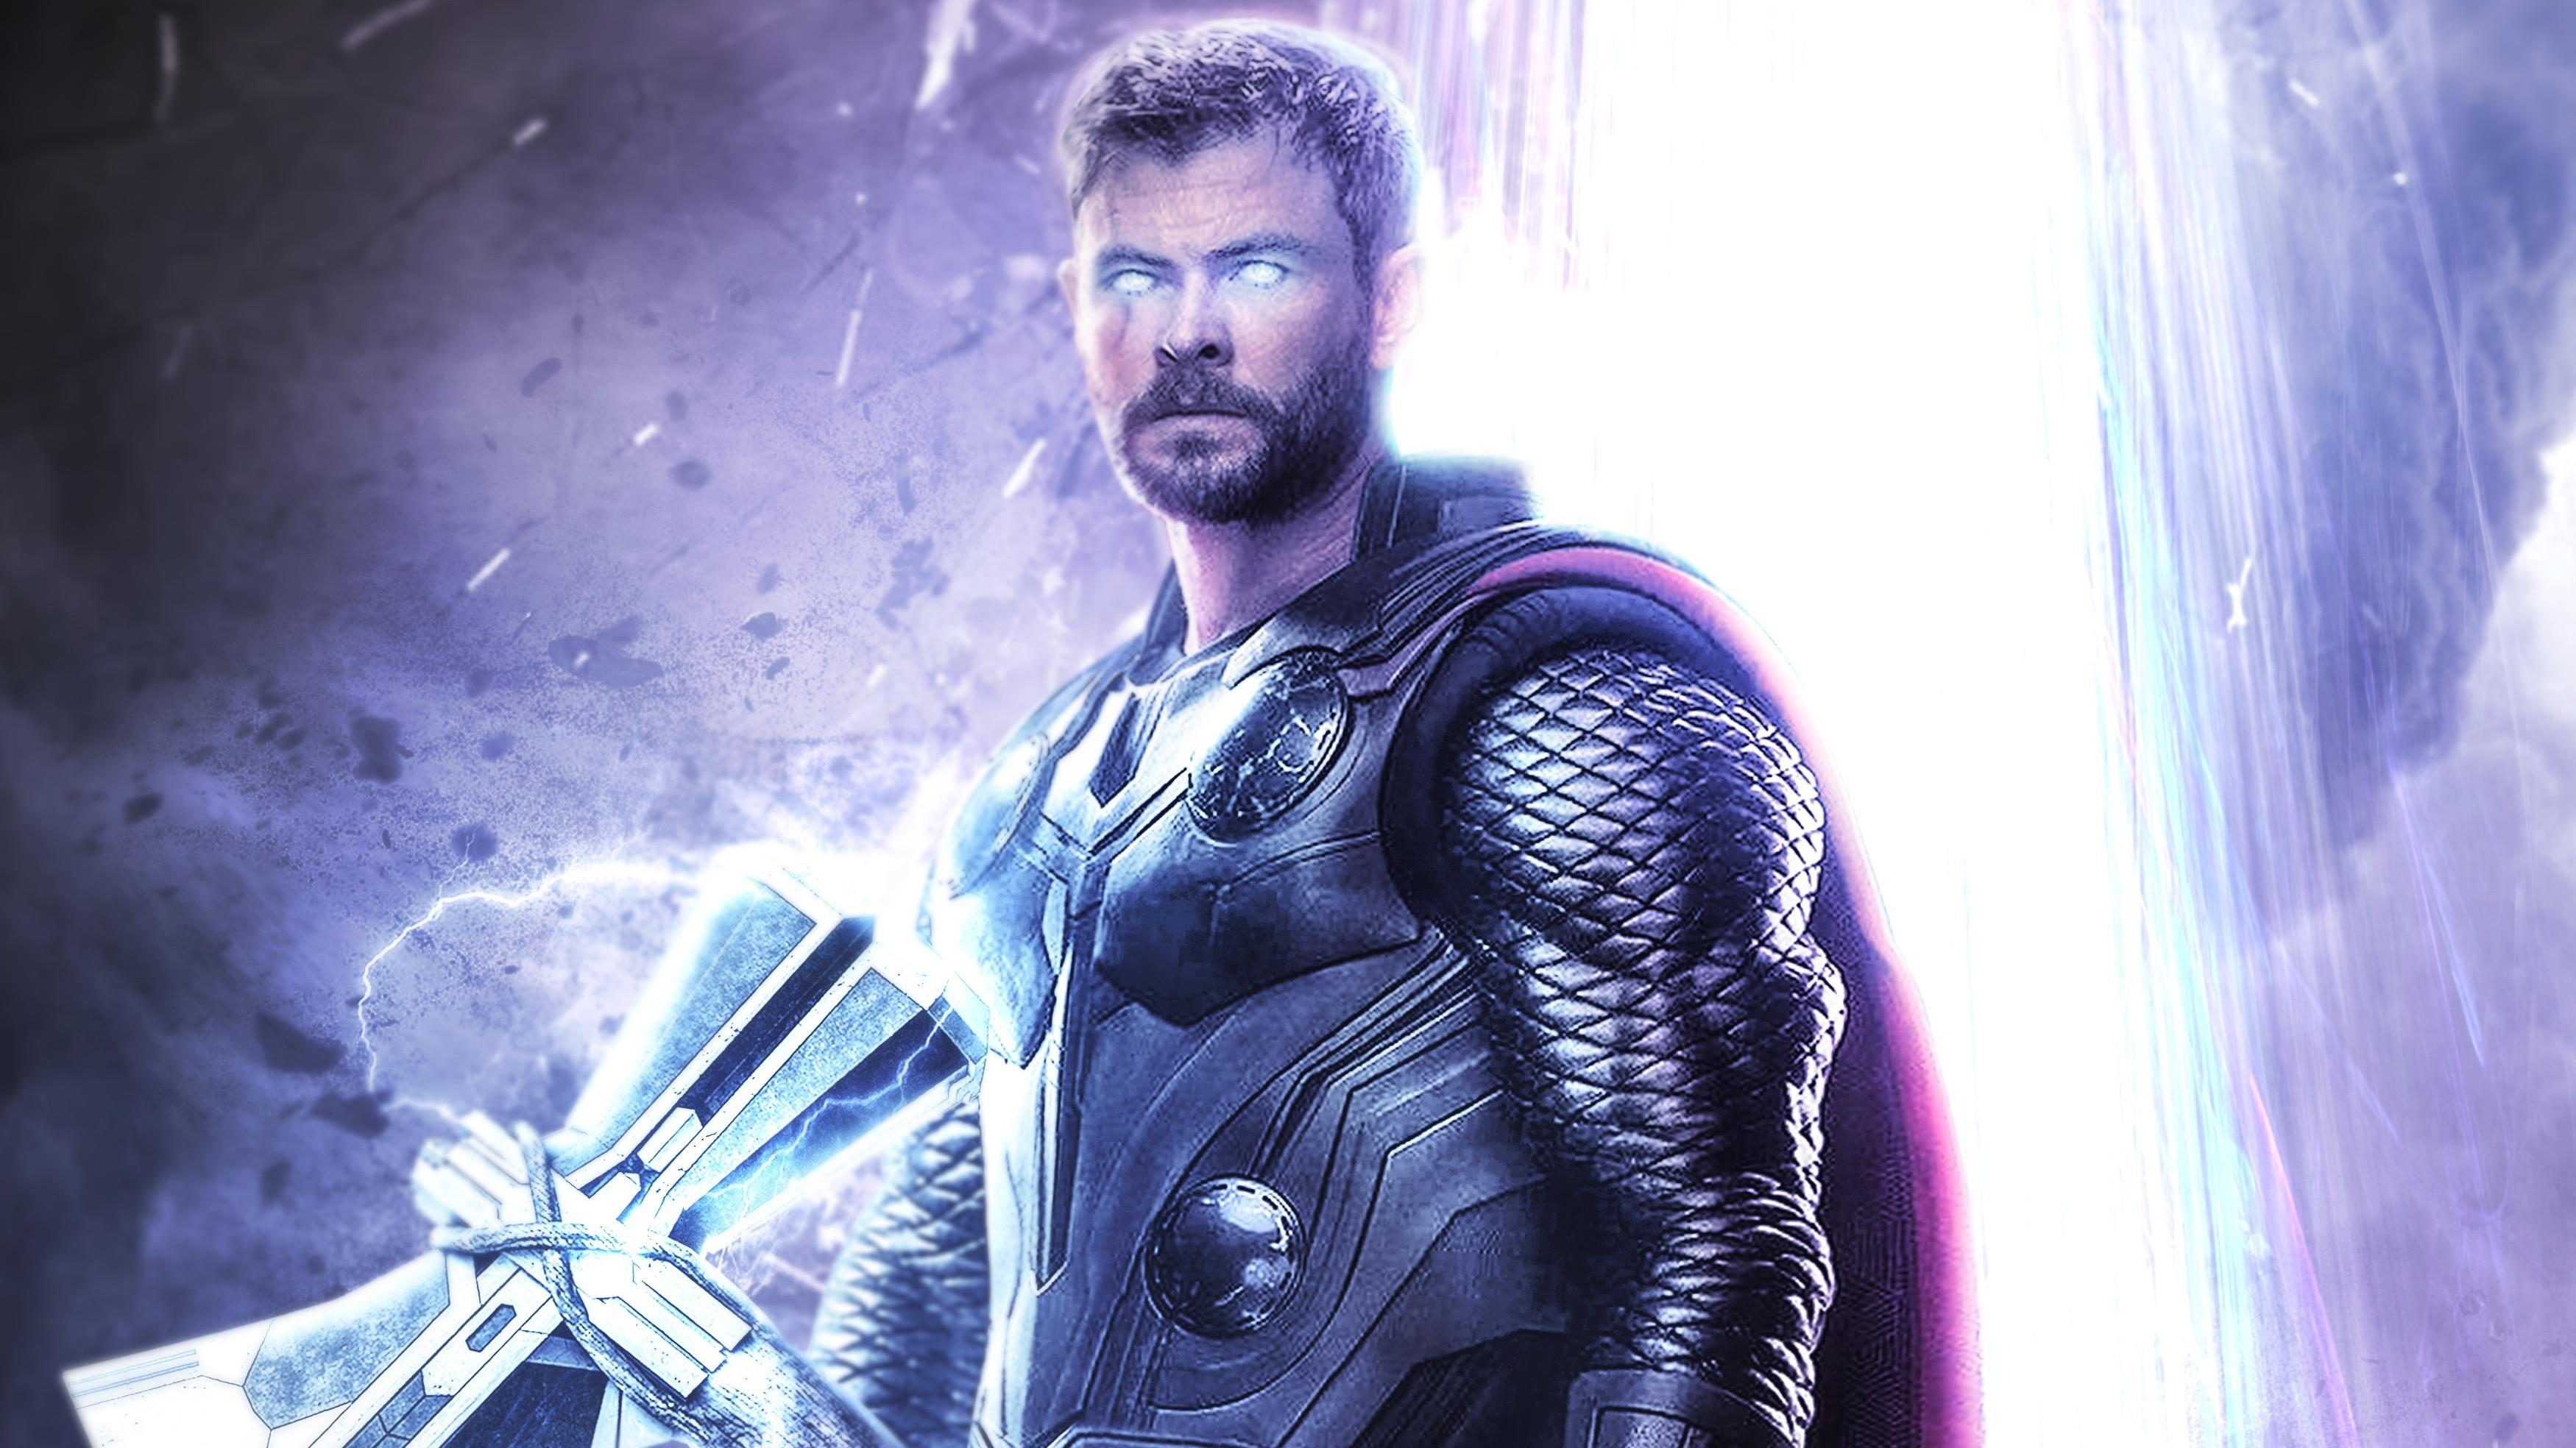 1280x2120 Thor Avengers Endgame IPhone 6+ HD 4k Wallpapers